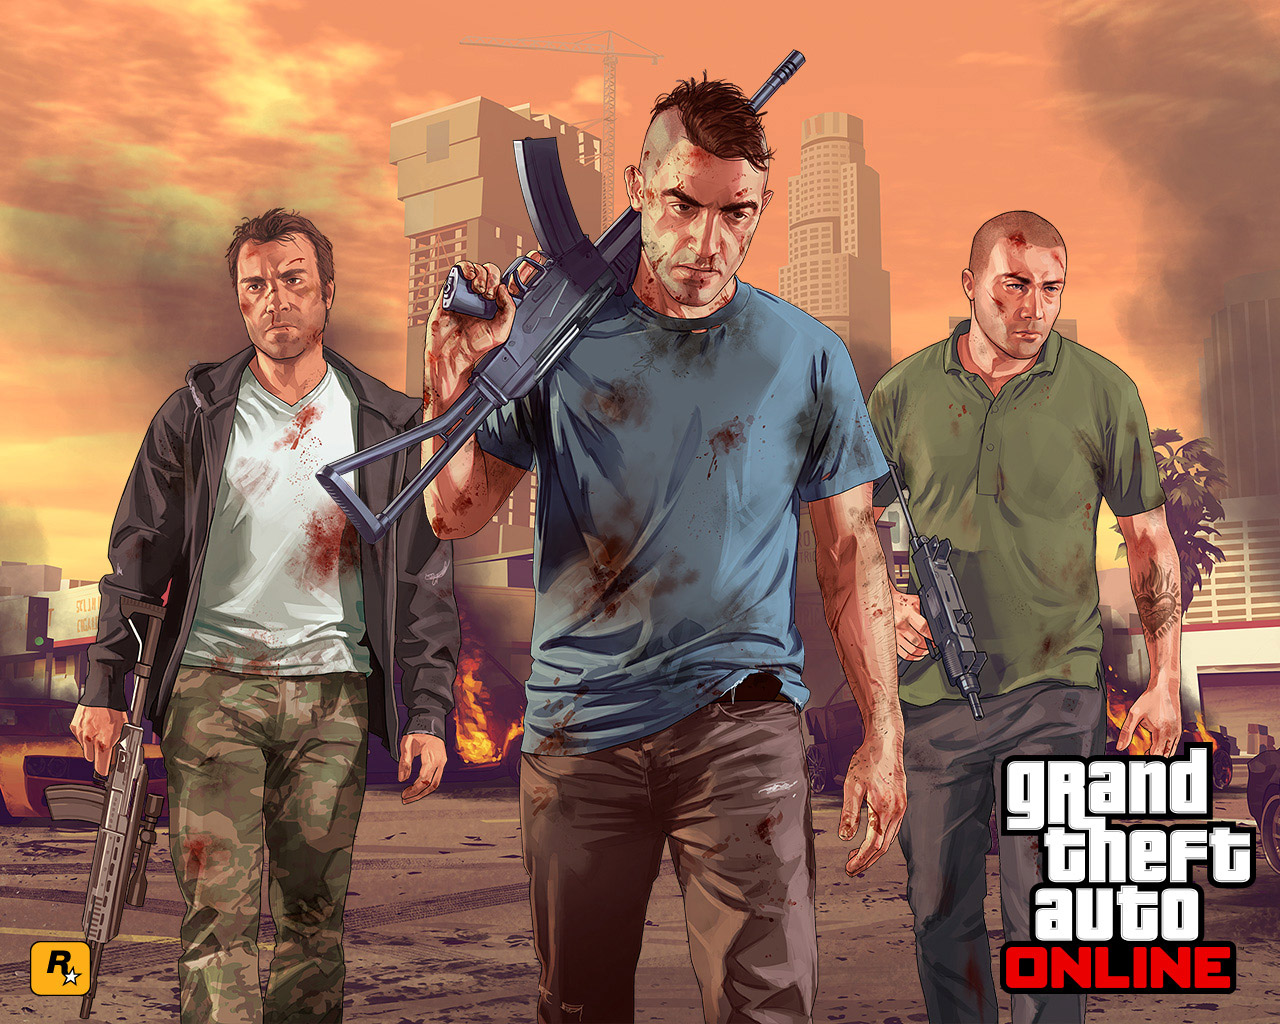 Free Grand Theft Auto V Wallpaper in 1280x1024